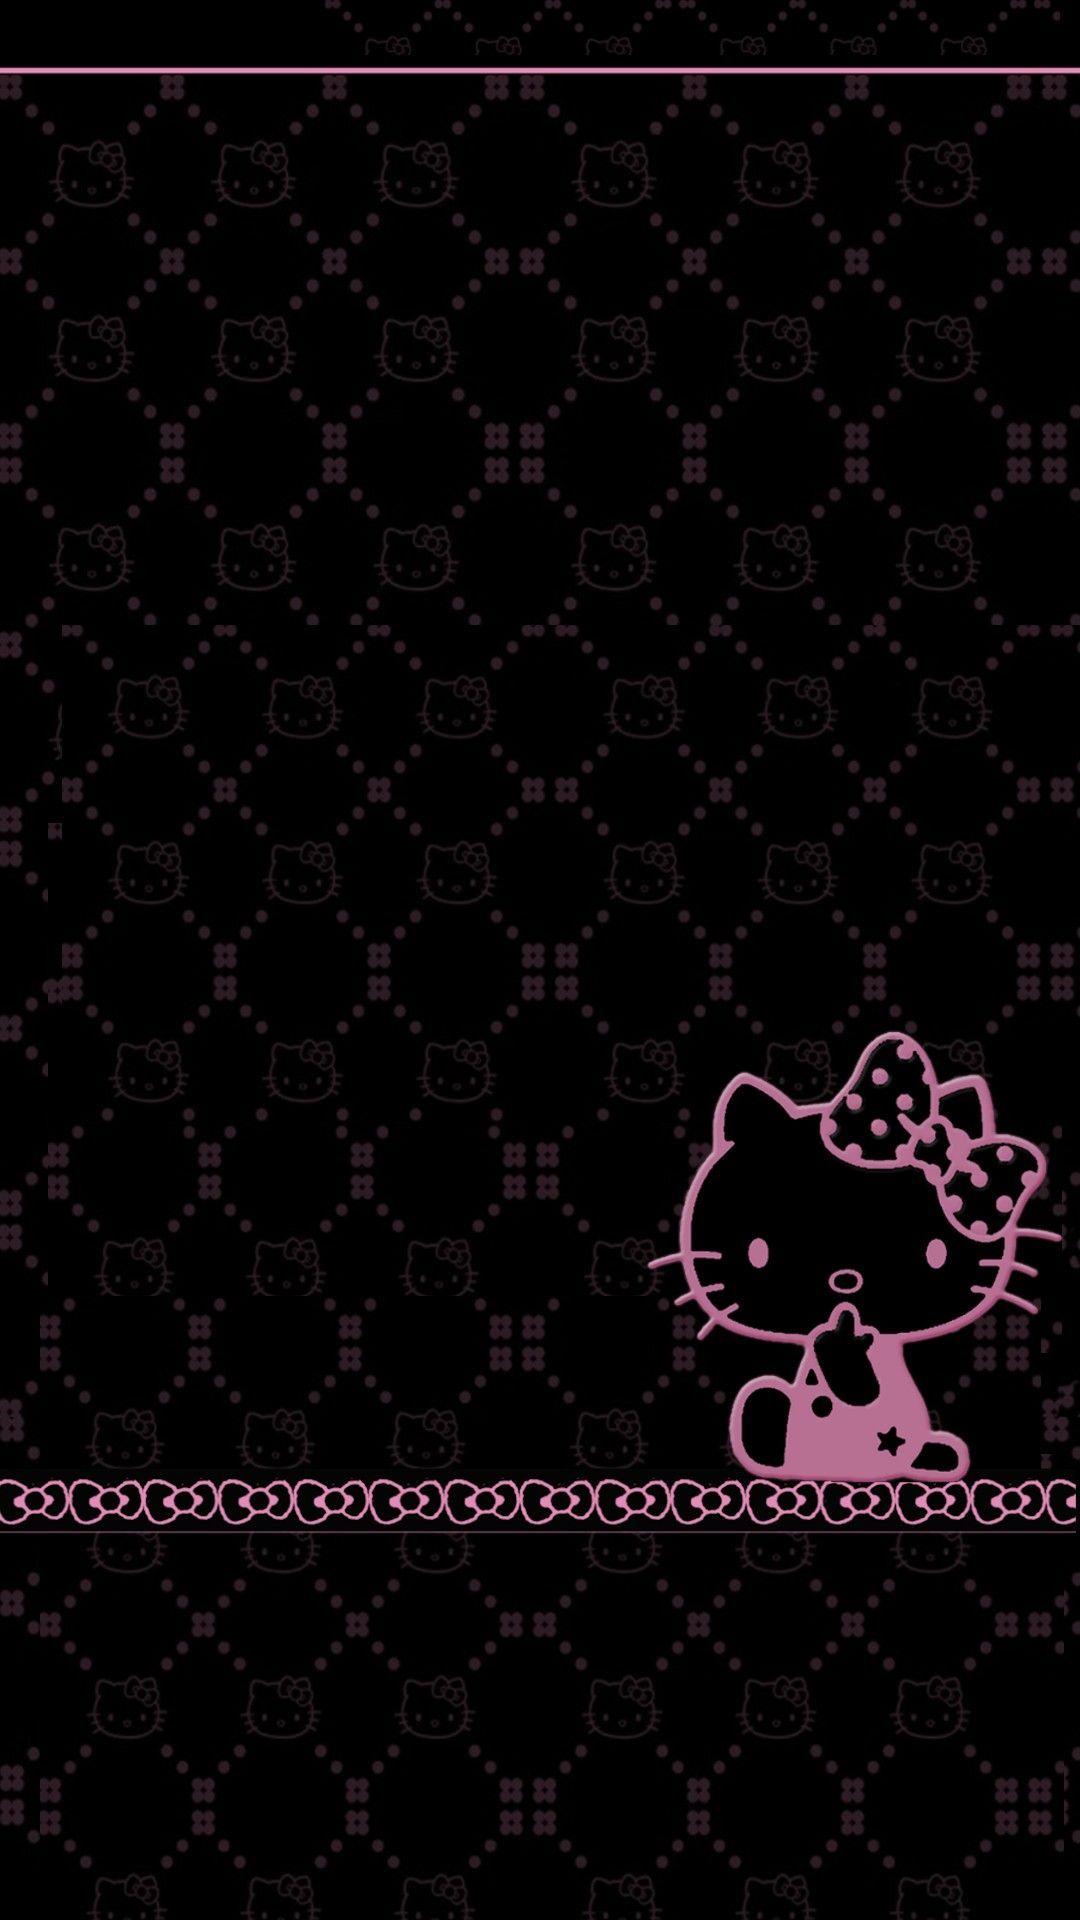 Black Hello Kitty Wallpaper Hd Hello Kitty Wallpaper Hd Hello Kitty Wallpaper Hello Kitty